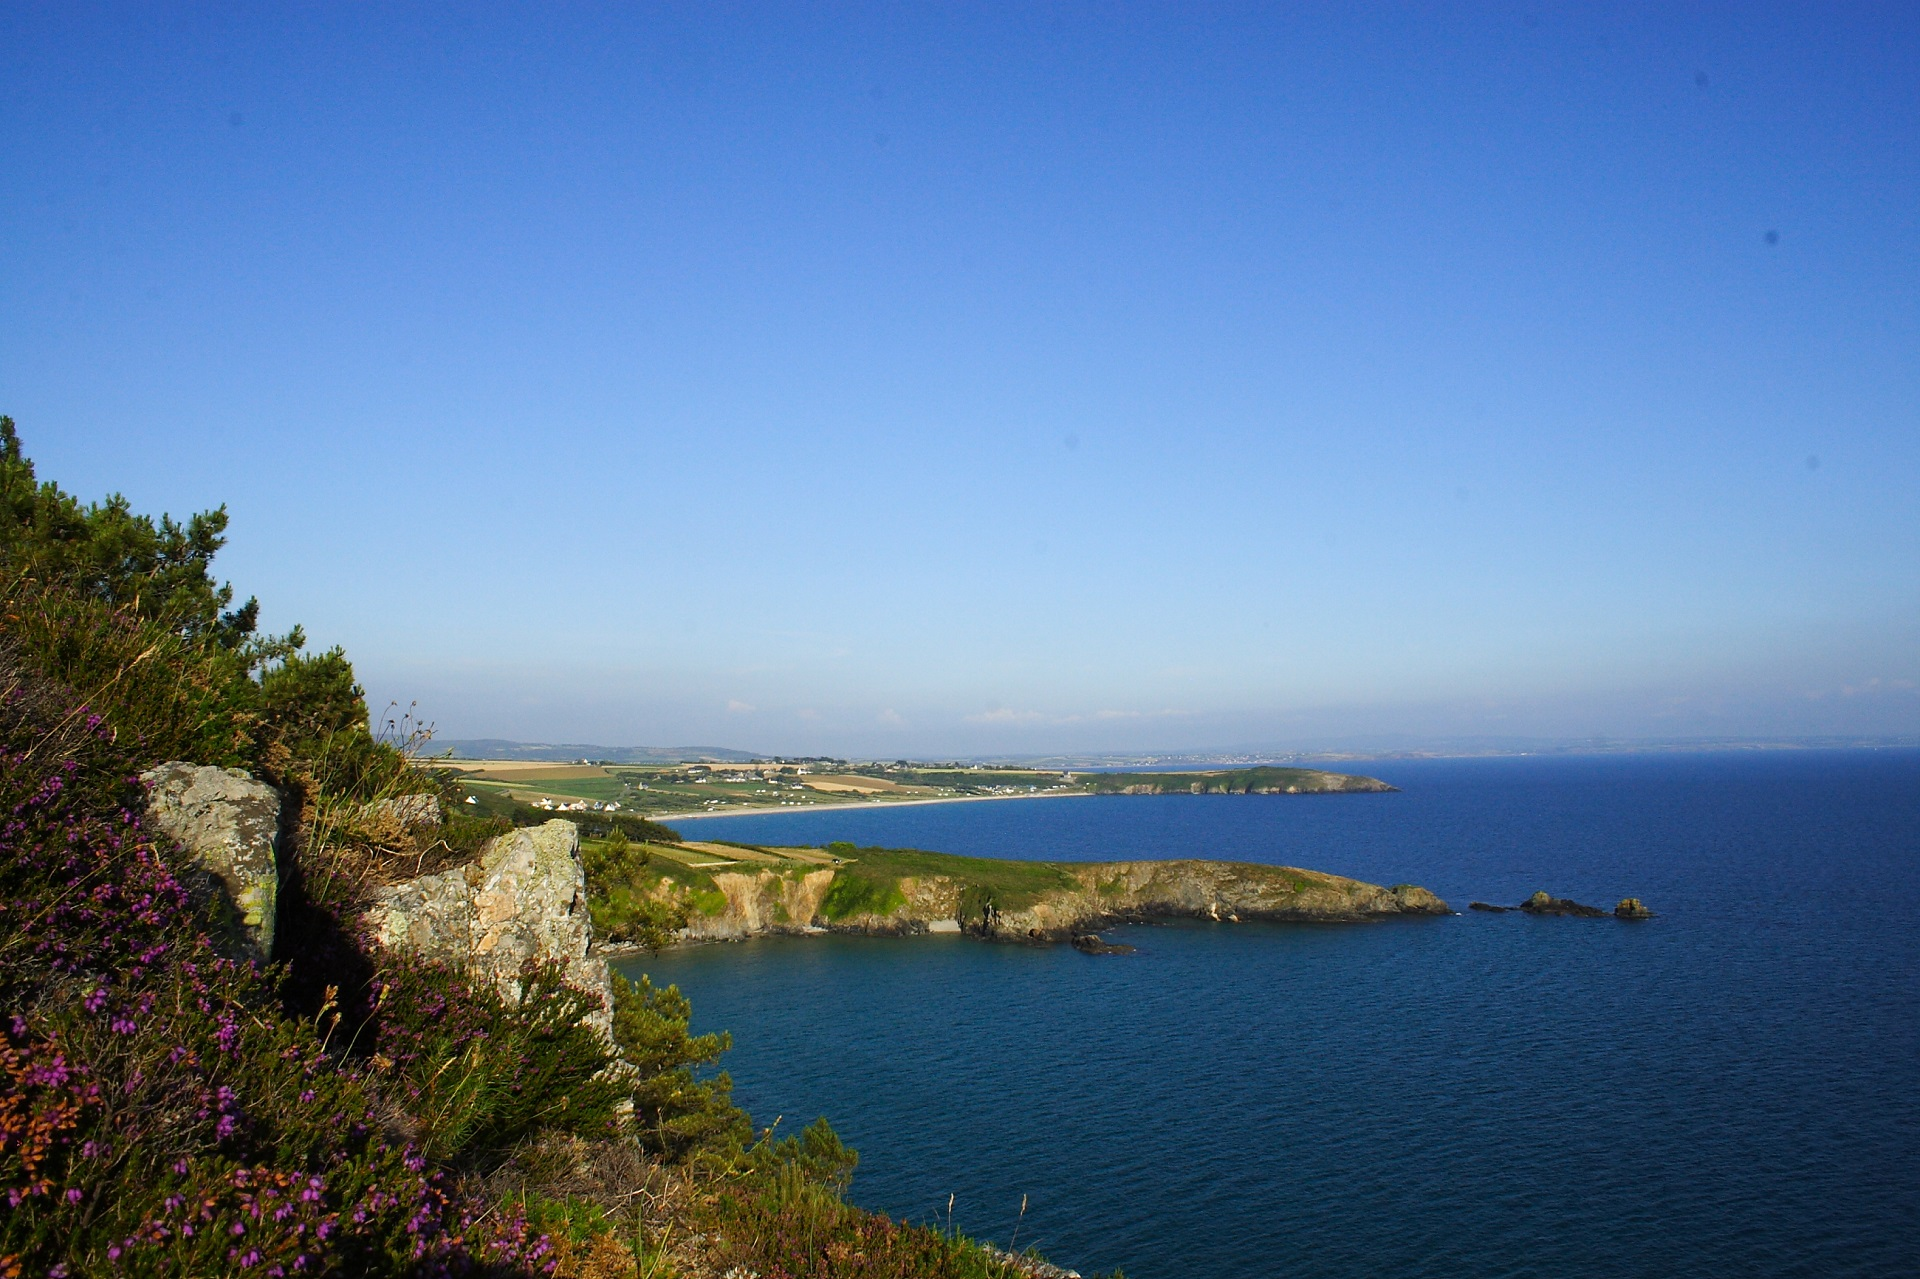 Camping le Panoramic, Telgruc-sur-Mer, Finistère